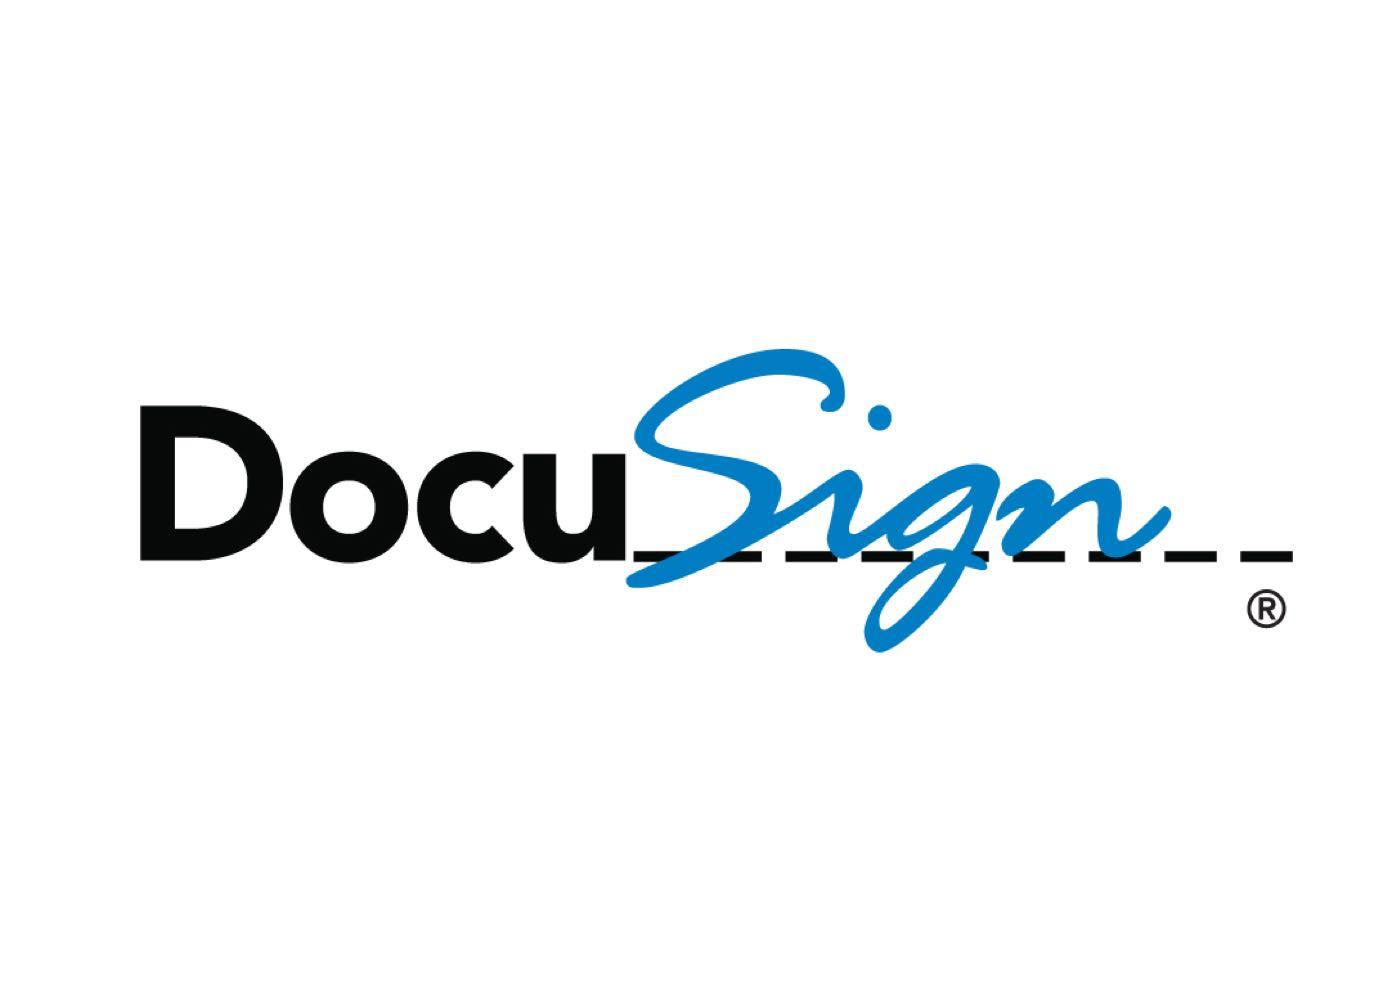 doccusign